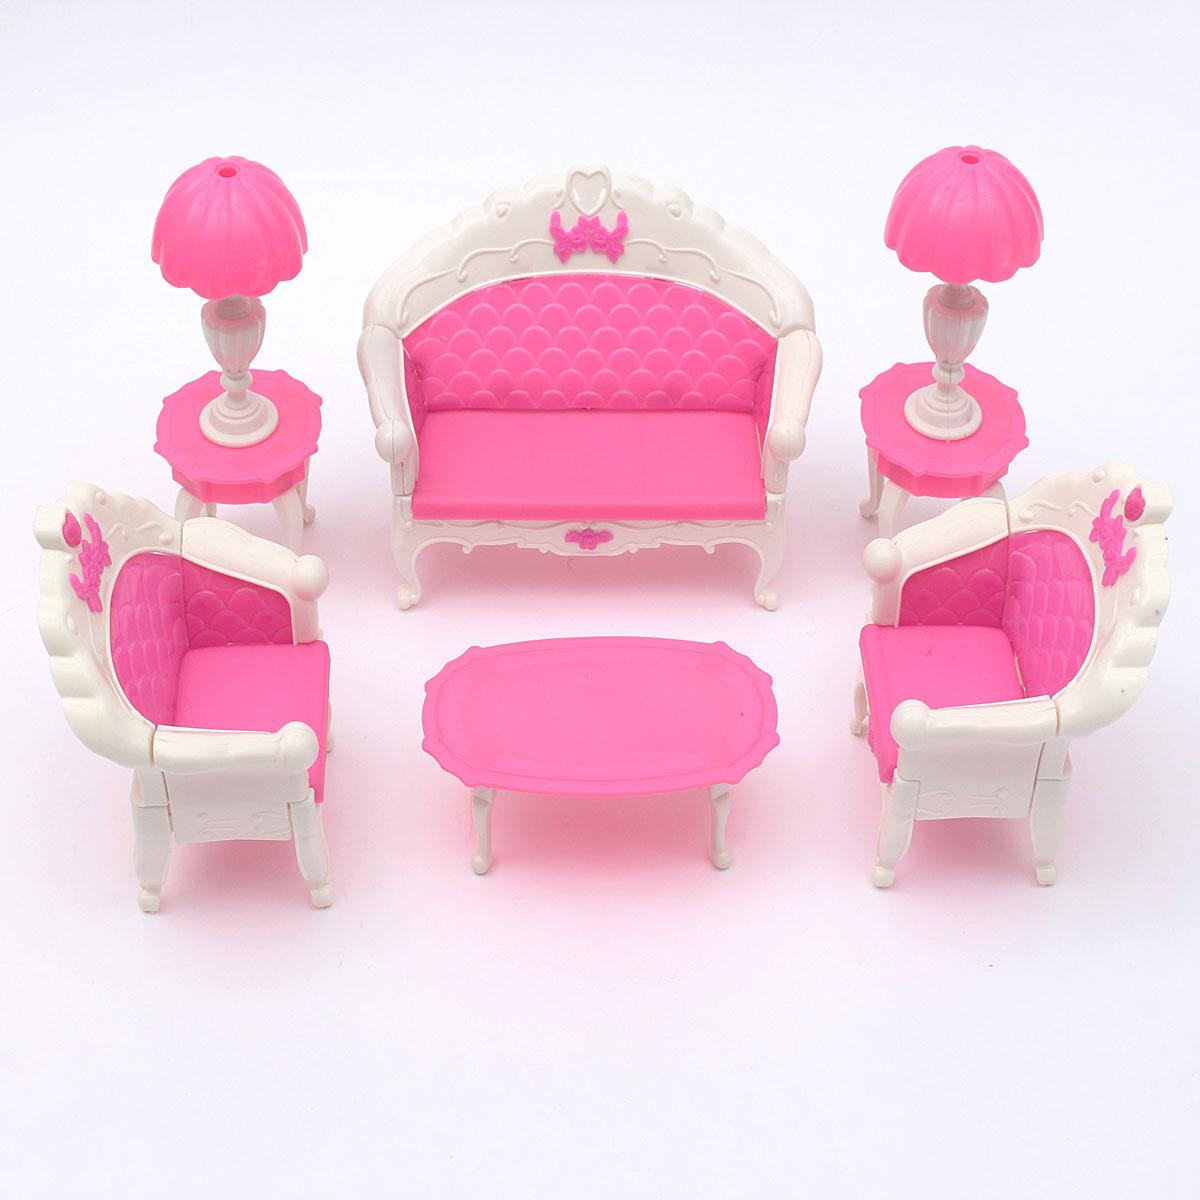 cheap dollhouse furniture. miniatura pink dollhouse furniture living room parlour sofa set for doll accessories toys children cheap